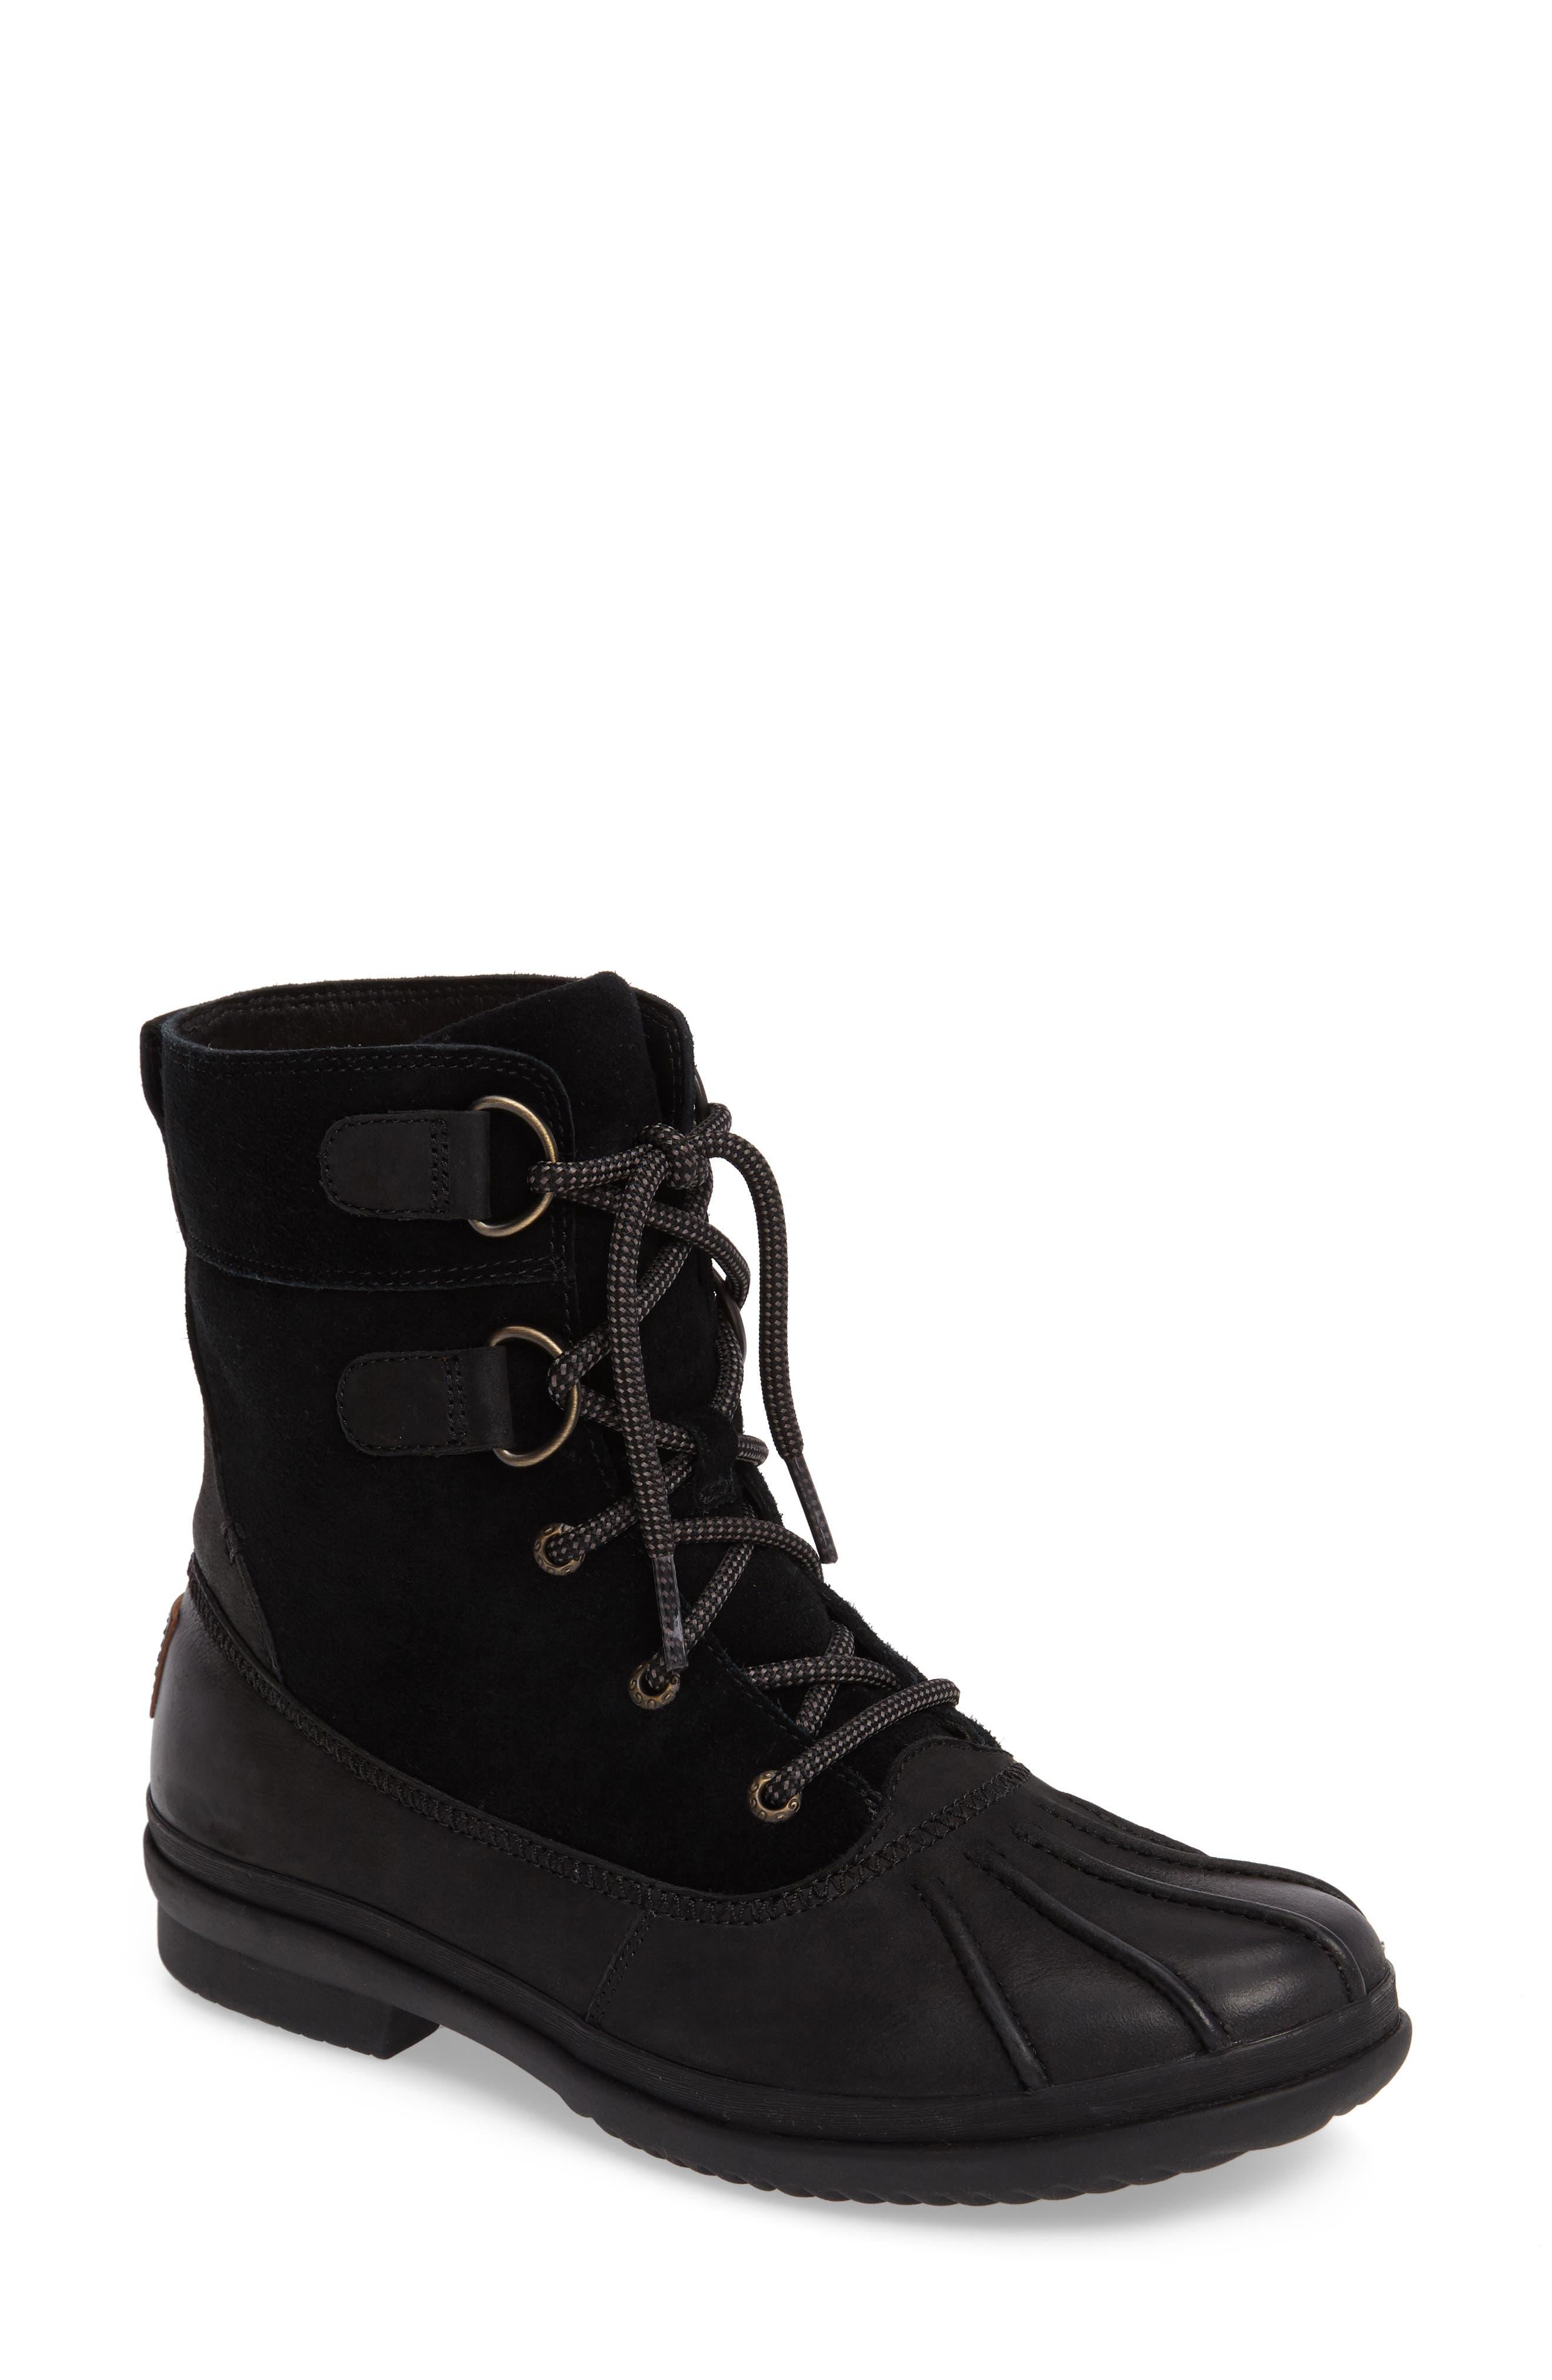 Azaria Waterproof Boot,                             Main thumbnail 1, color,                             001